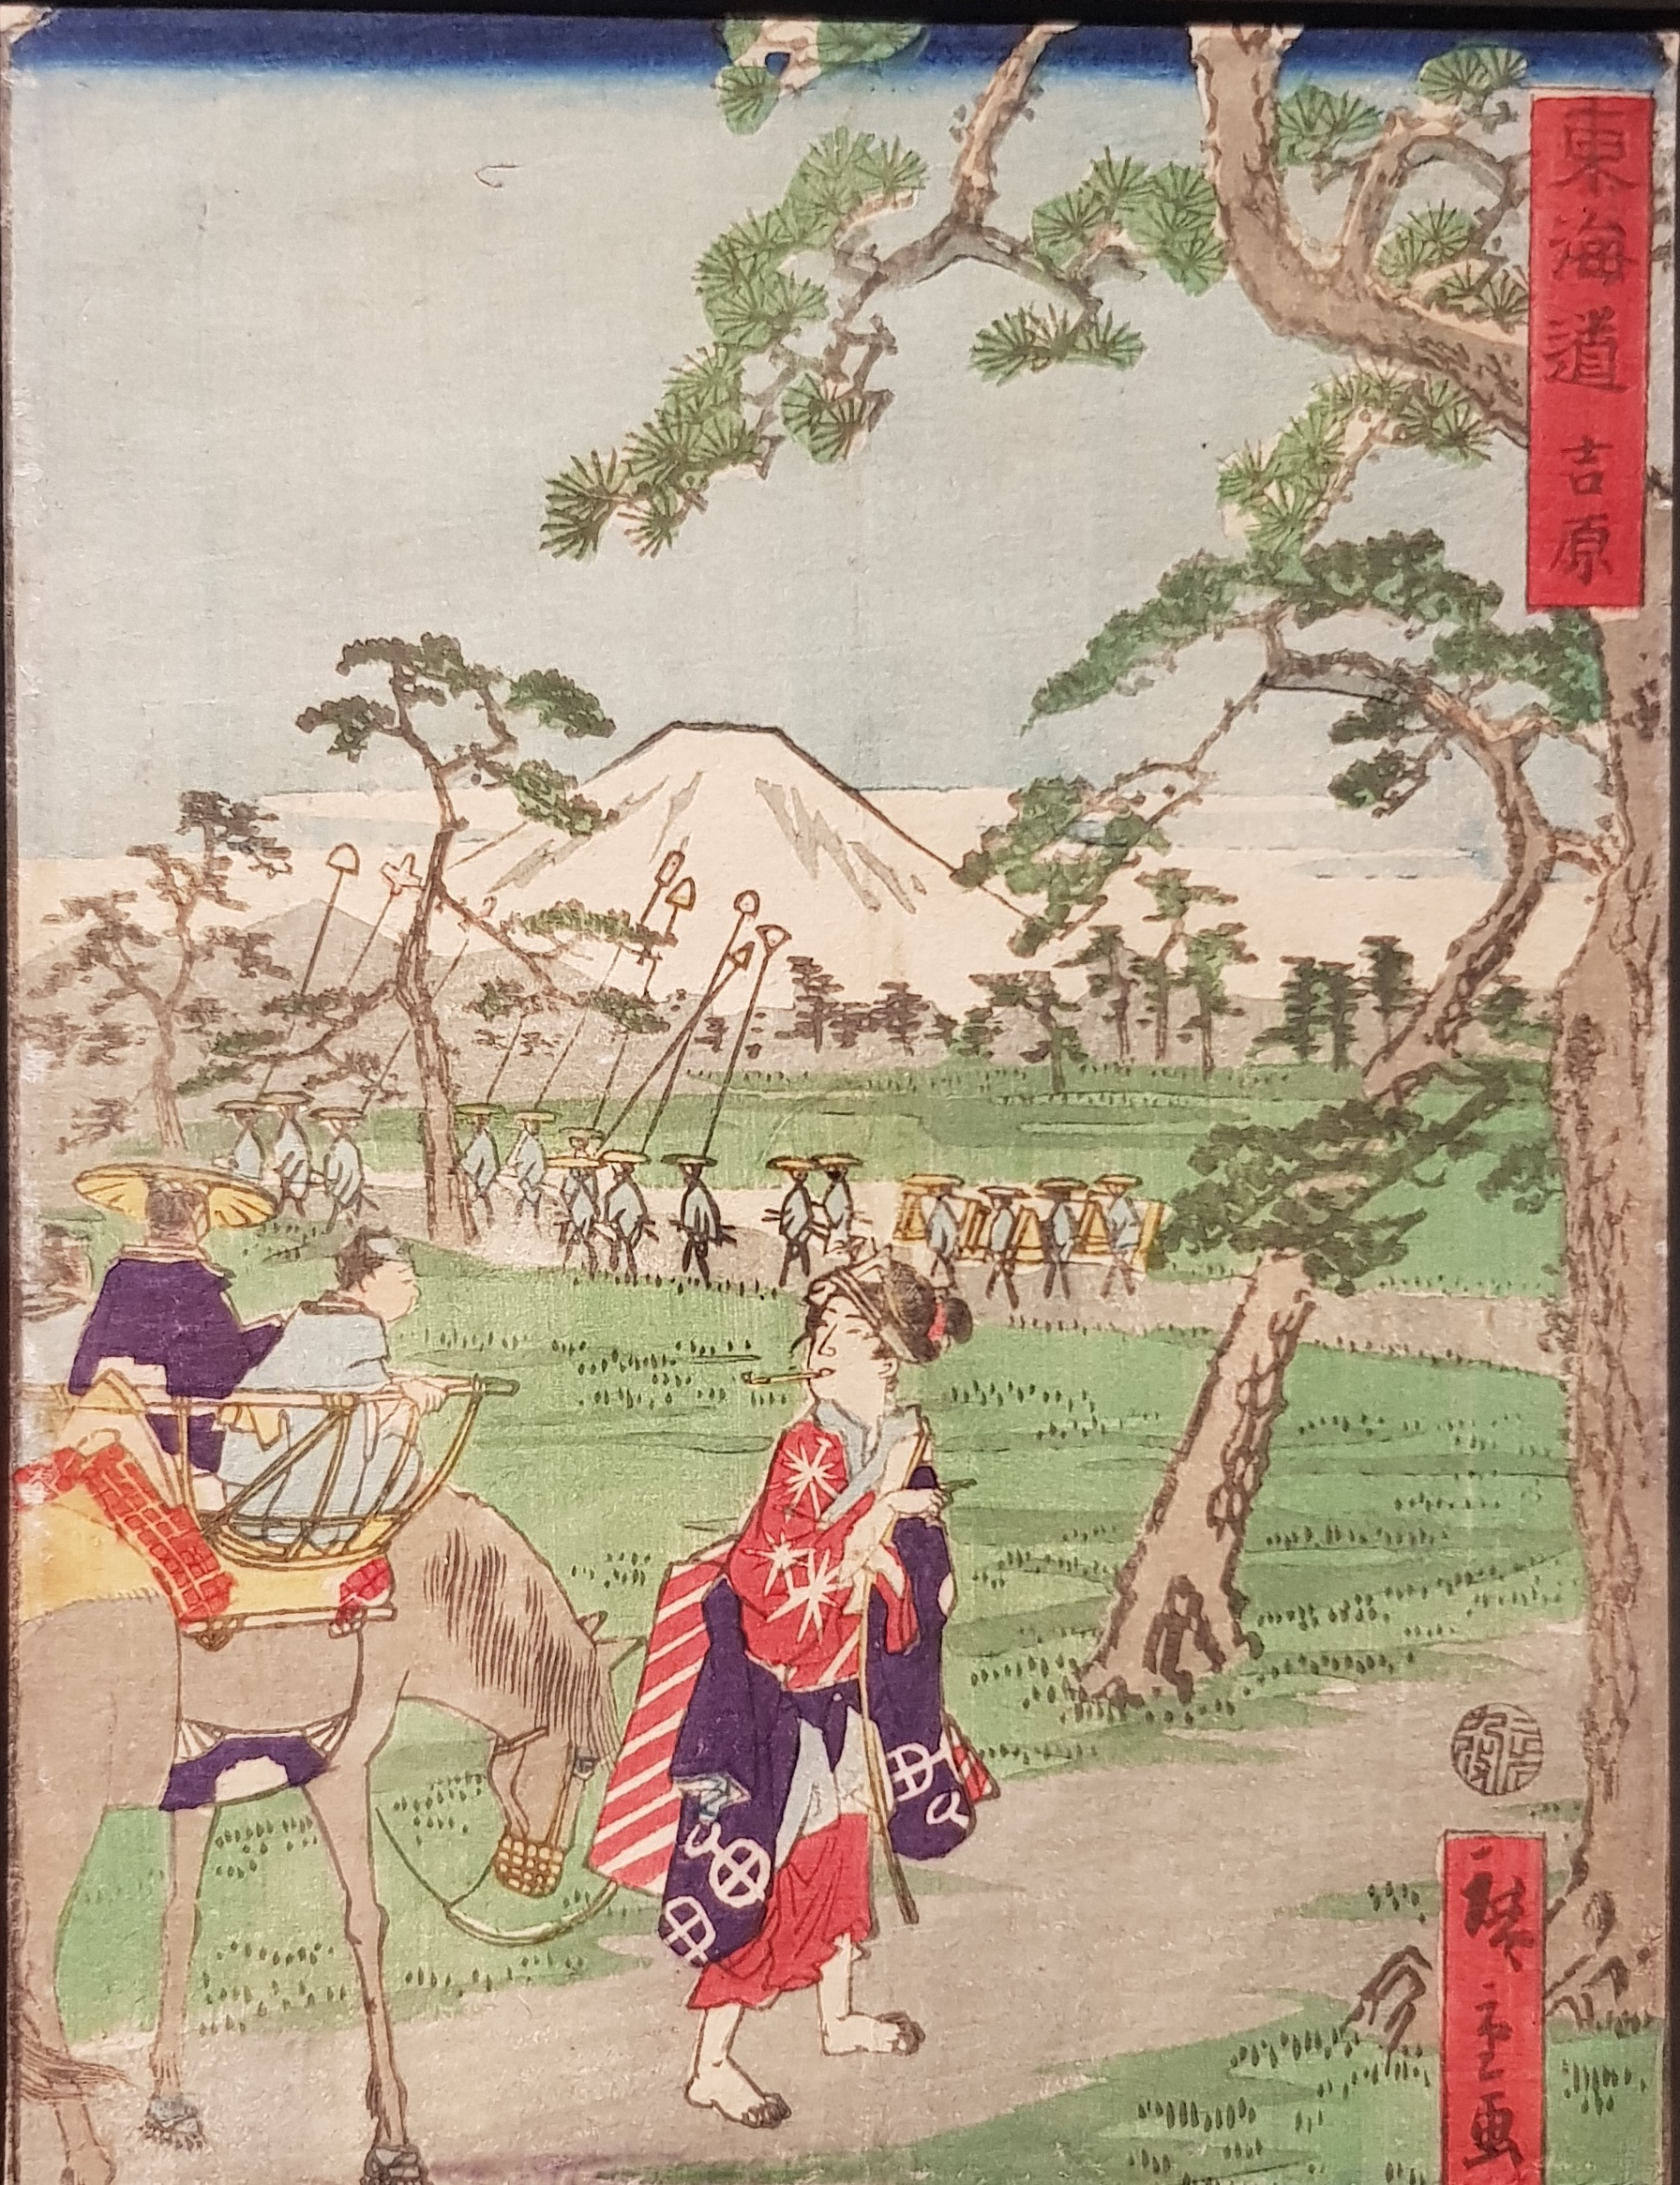 Japon - Estampe originale Hiroshige II - Tokaïdo - Yoshiwara - Edo 1863 Image